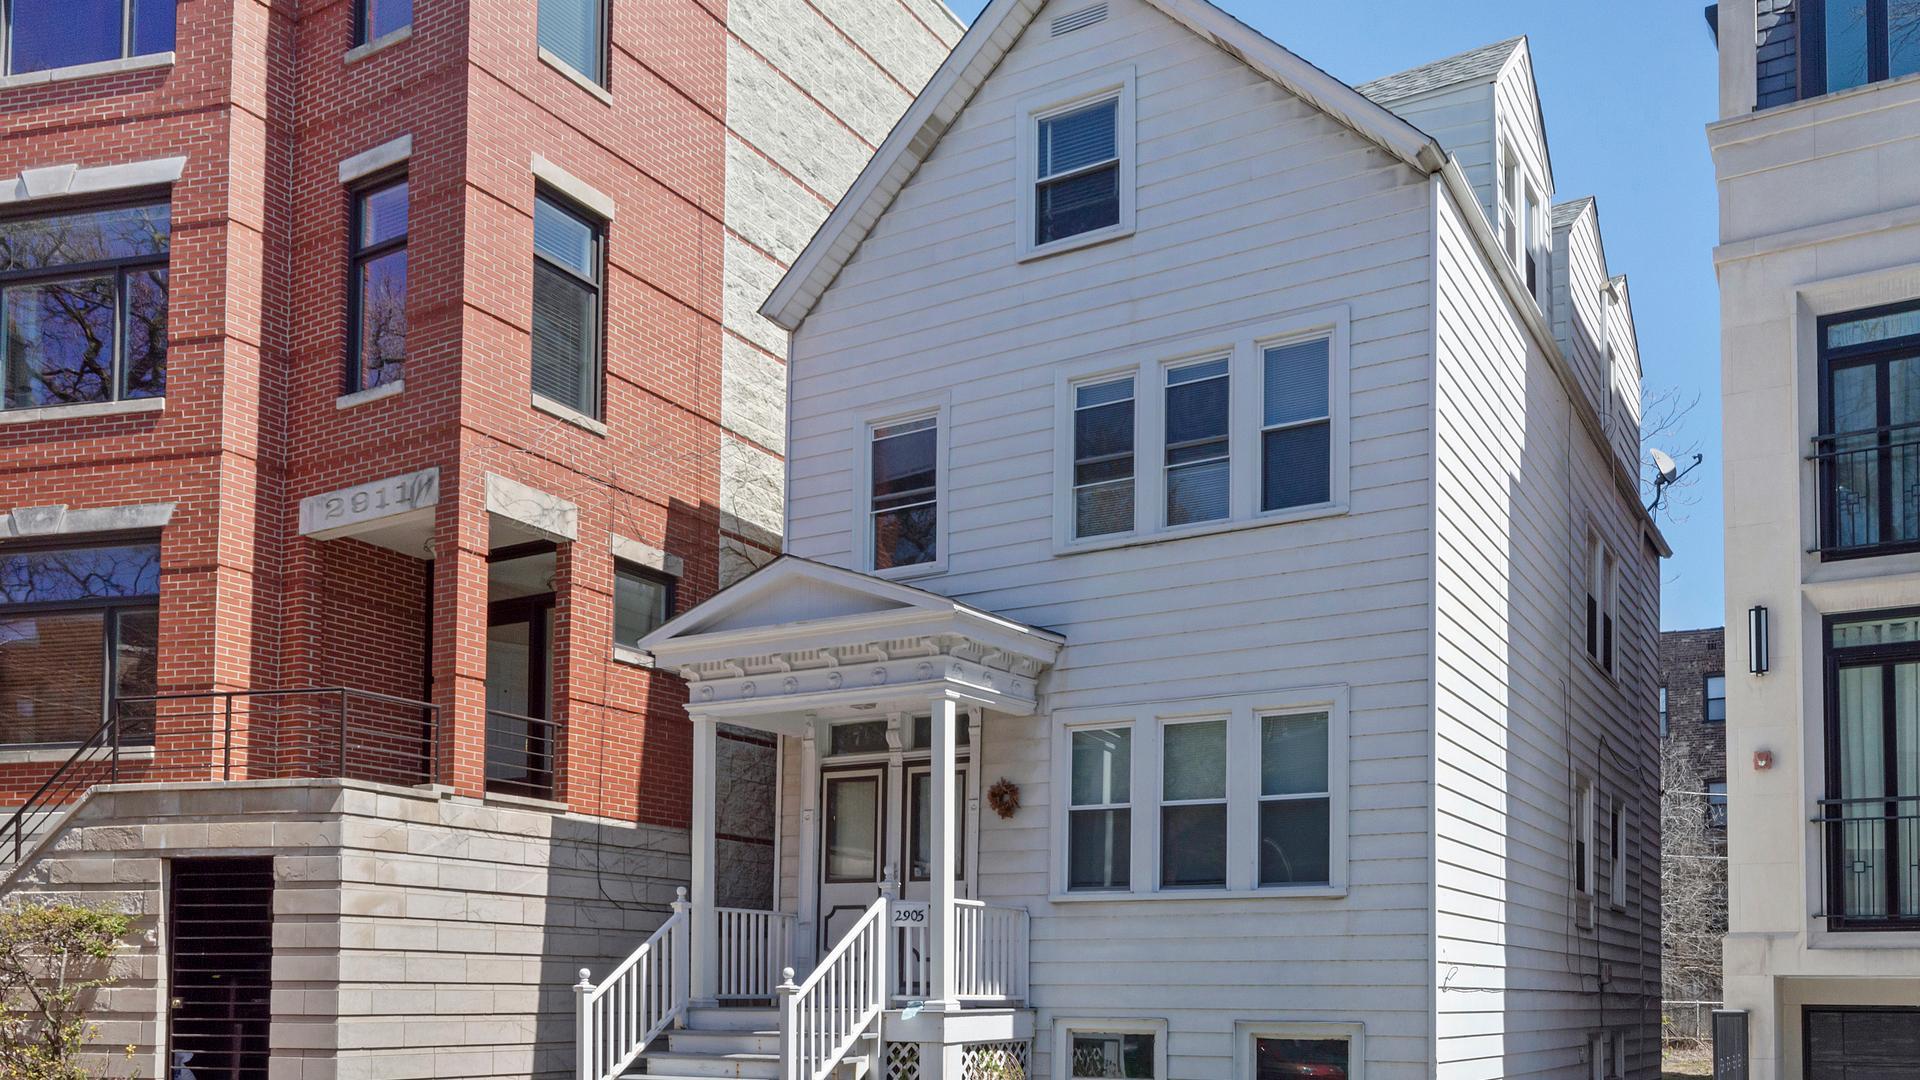 2905 N Burling  Street, Unit 2 photo